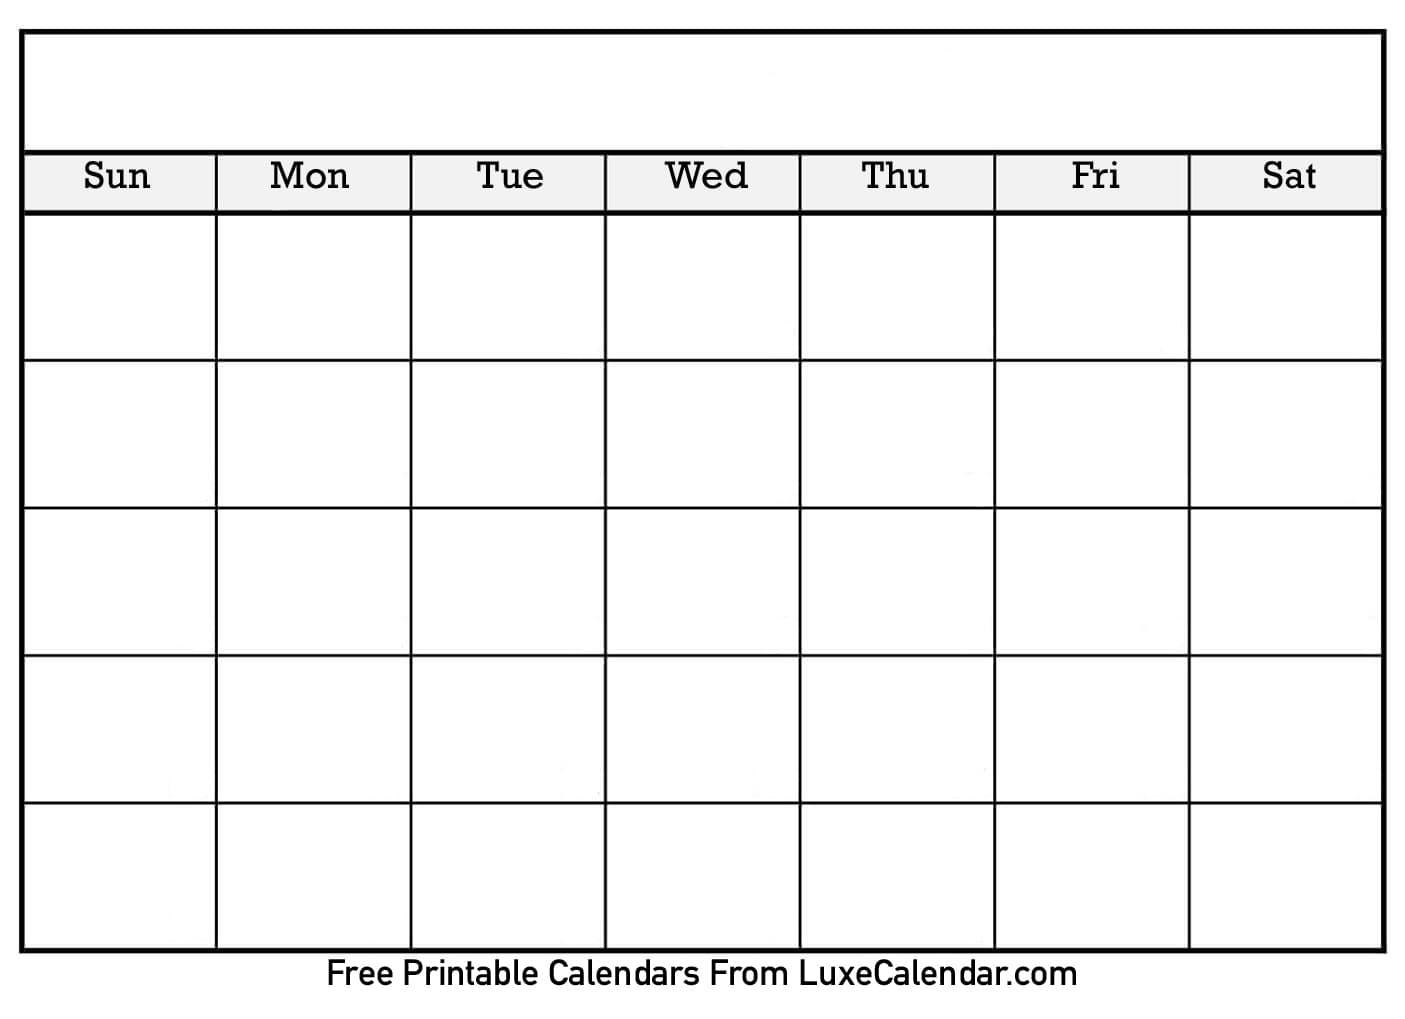 Blank Printable Calendar - Luxe Calendar intended for Blank Calendar For A Month